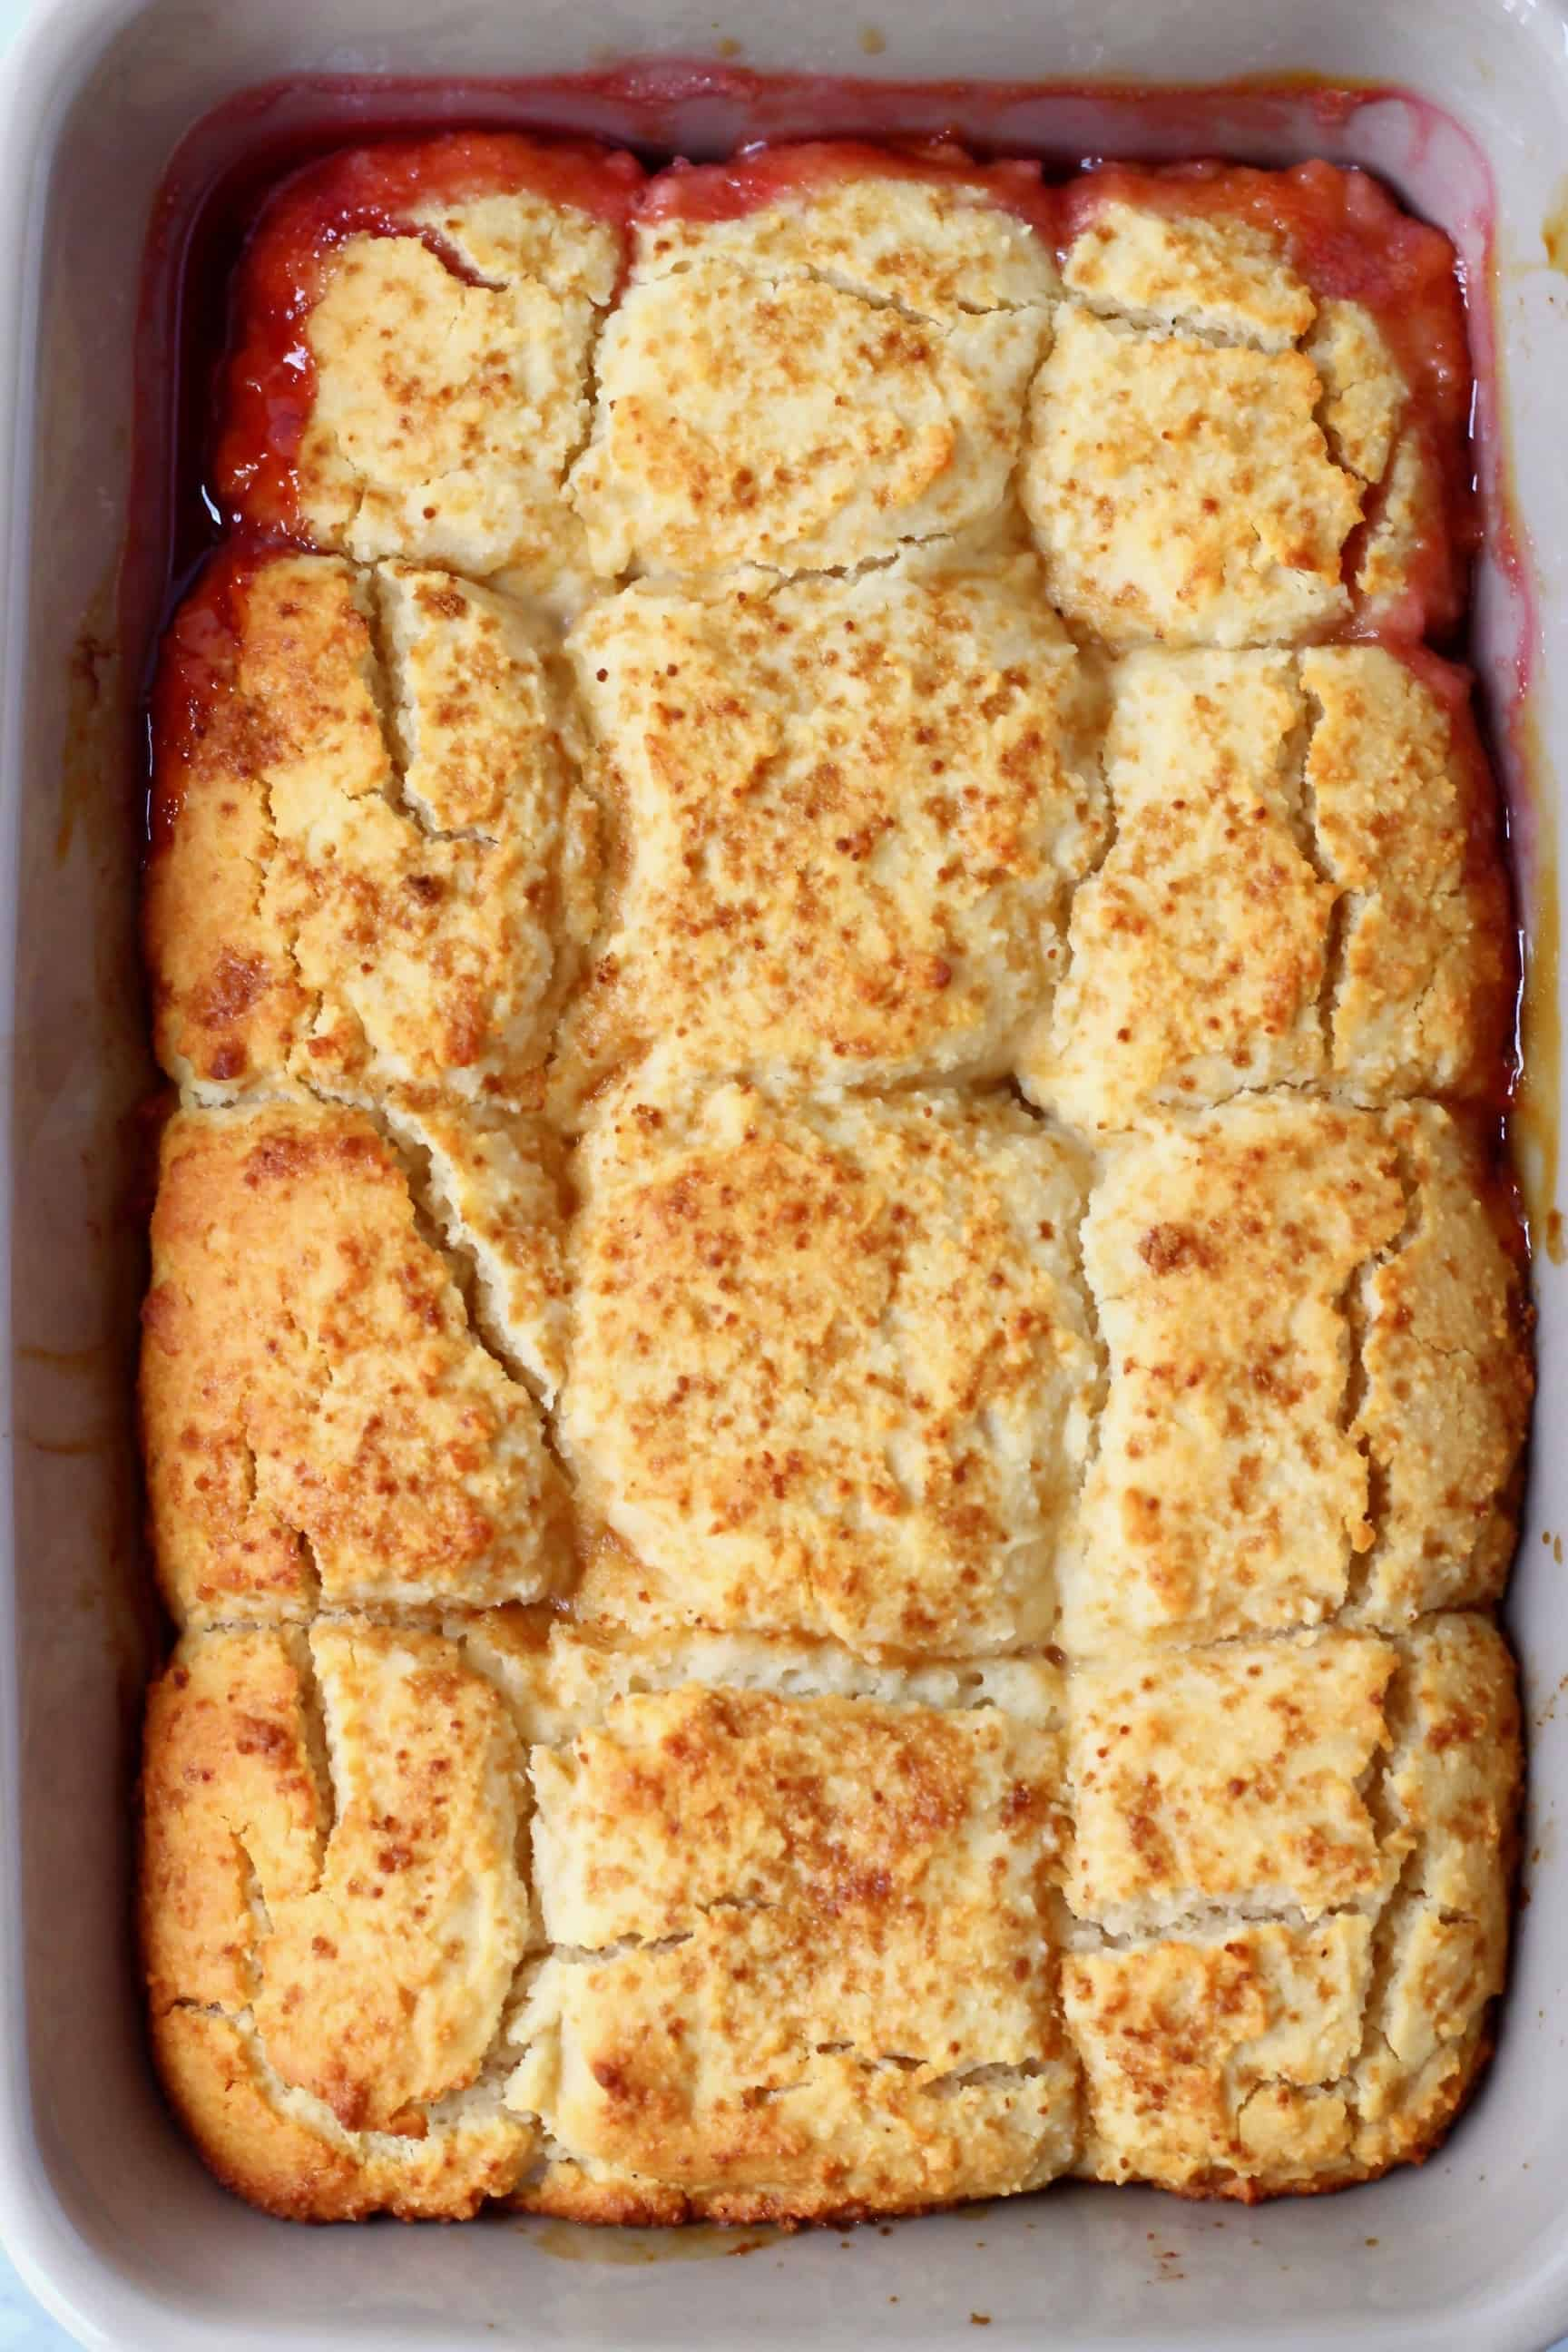 Peach cobbler in a rectangular grey baking tray